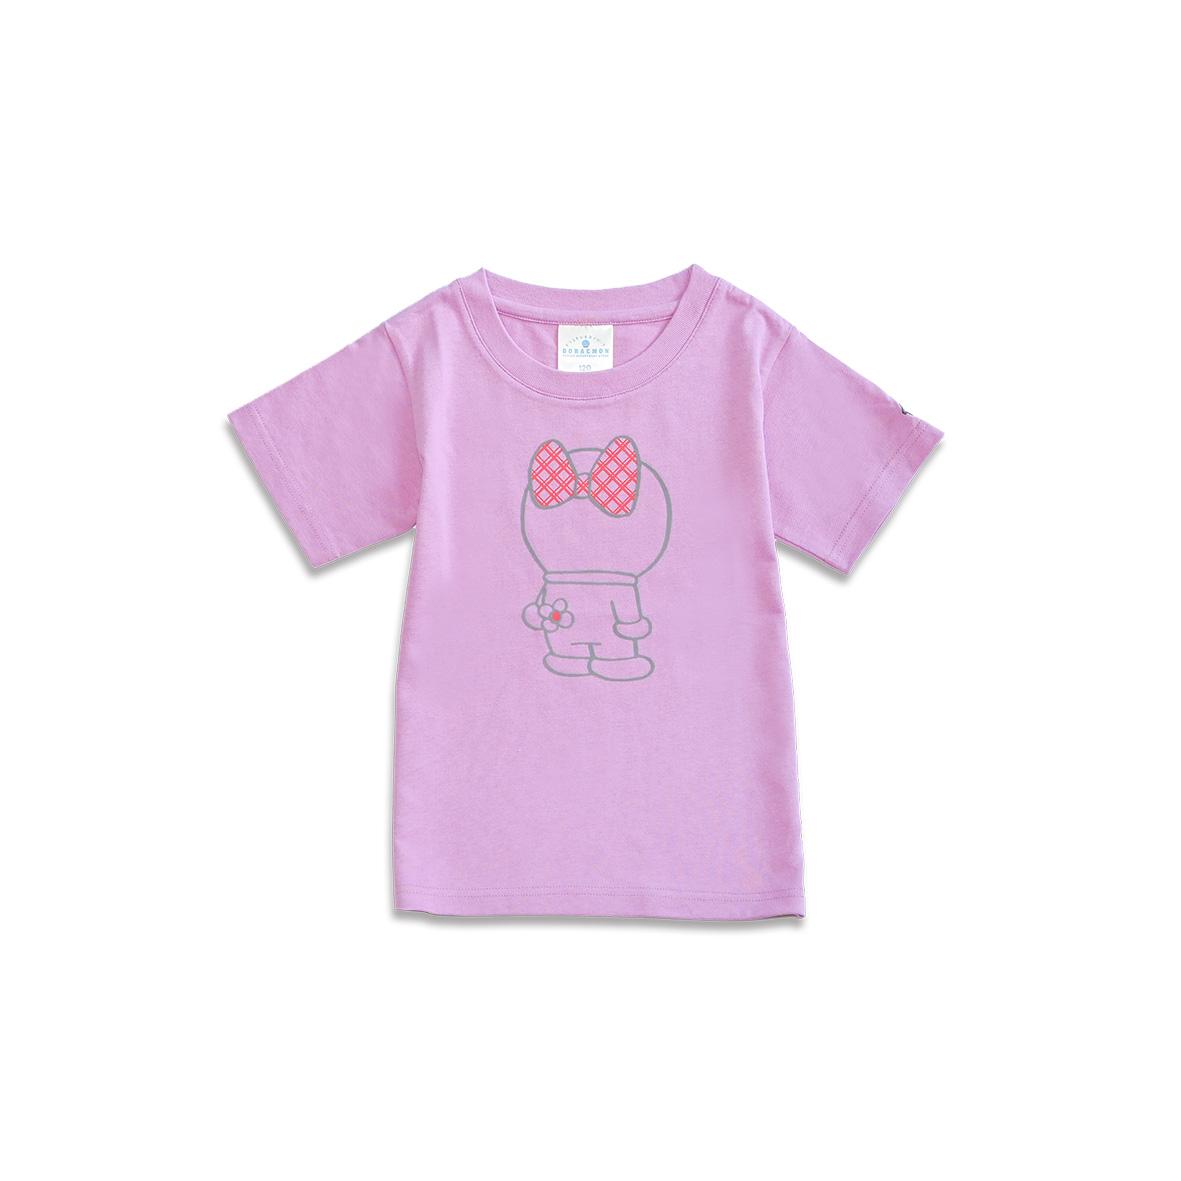 Tシャツ ドラミ後ろすがた ピンク130